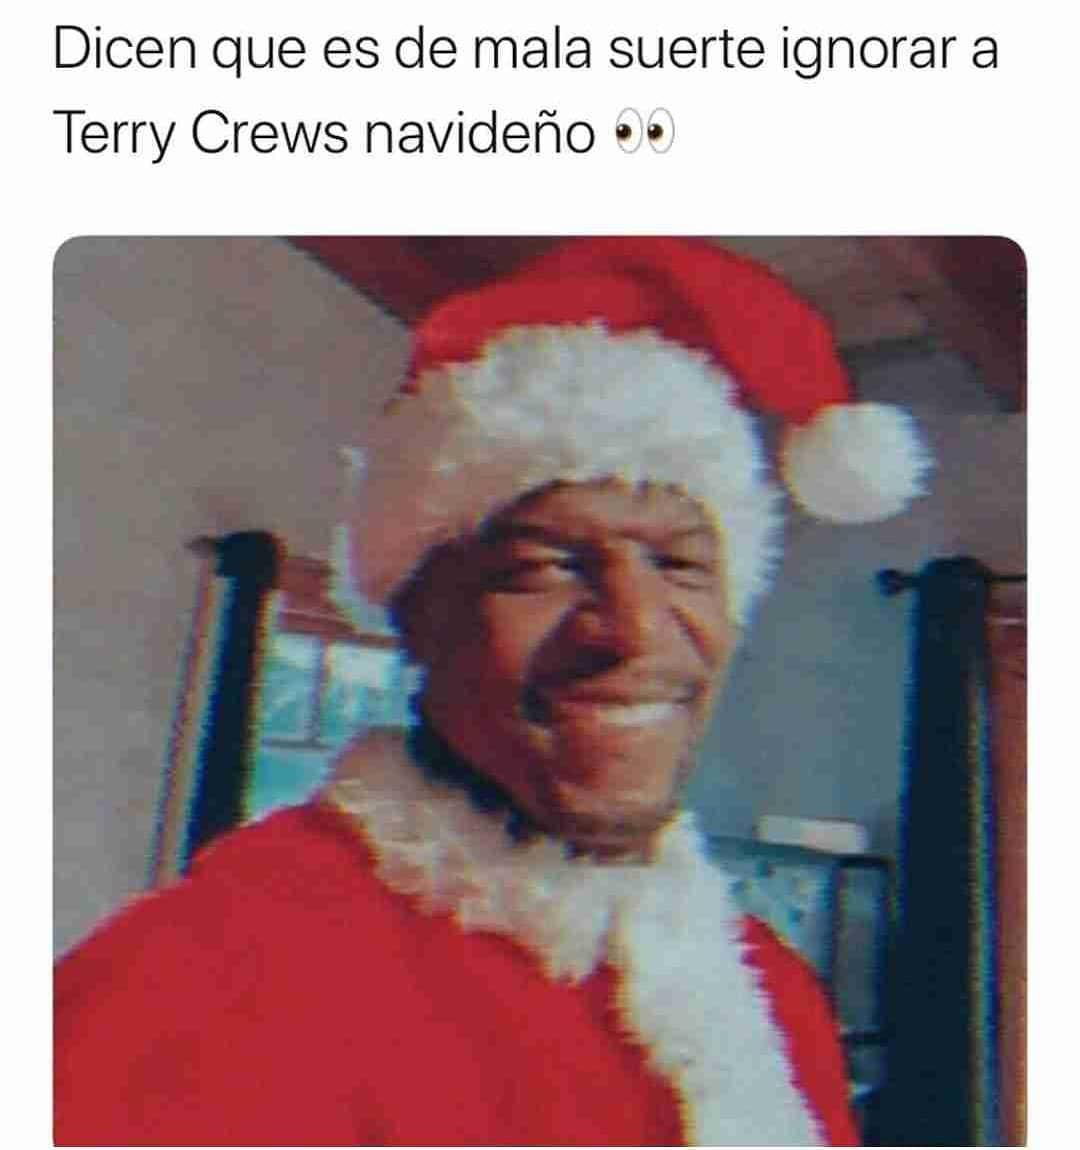 Dicen que es de mala suerte ignorar a Terry Crews navideño.